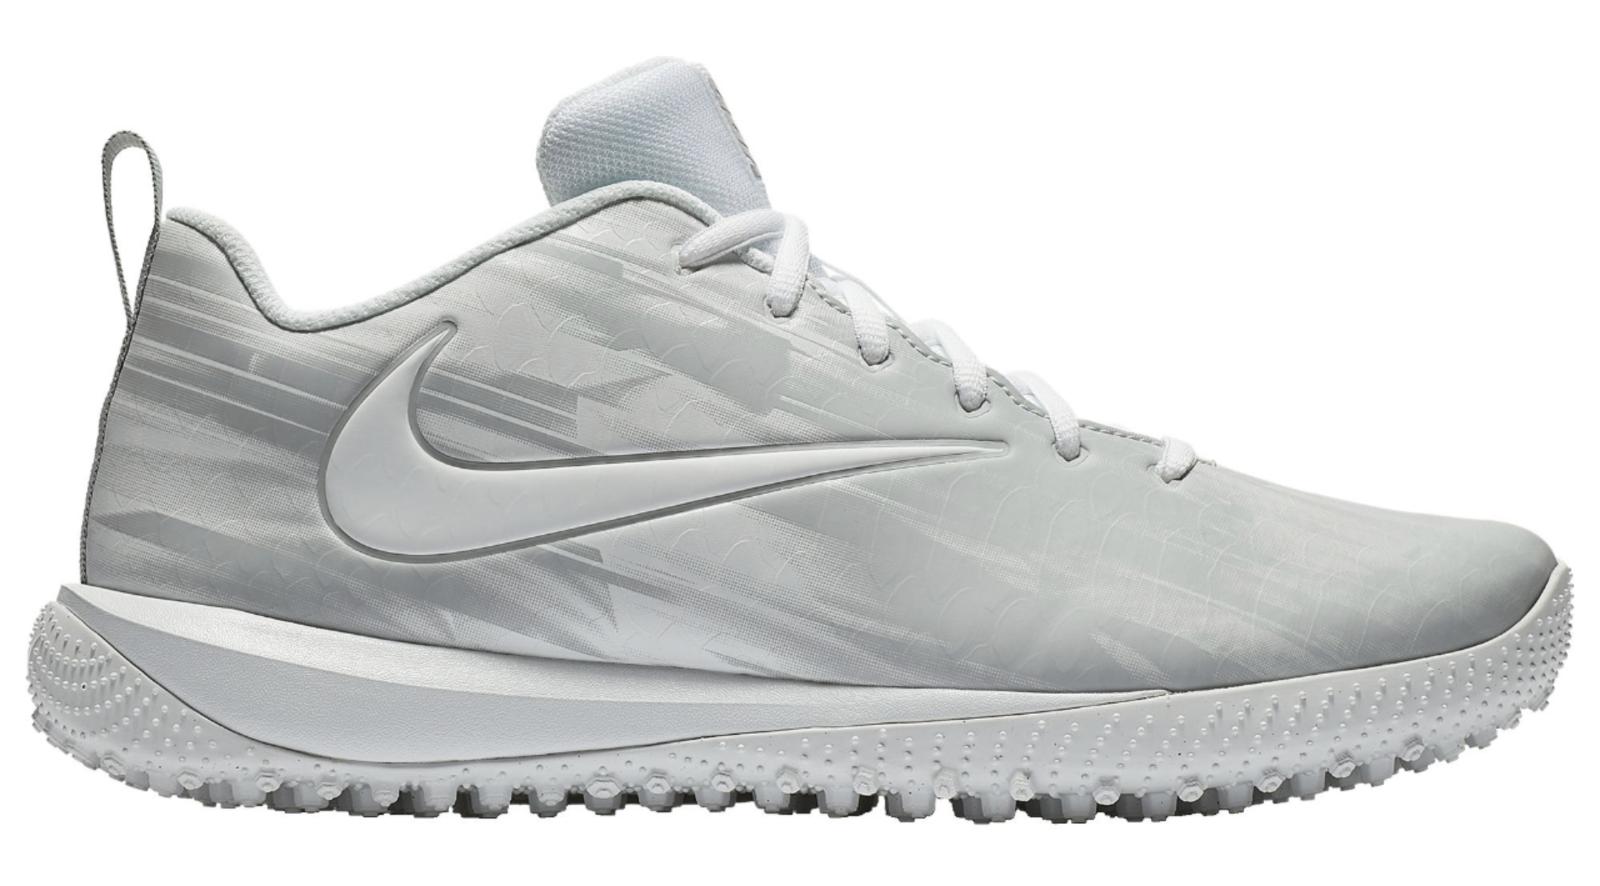 Nike air max 90 2,0 ultra 2,0 90 essenziale bianco puro platino 875695-101 Uomo 242822